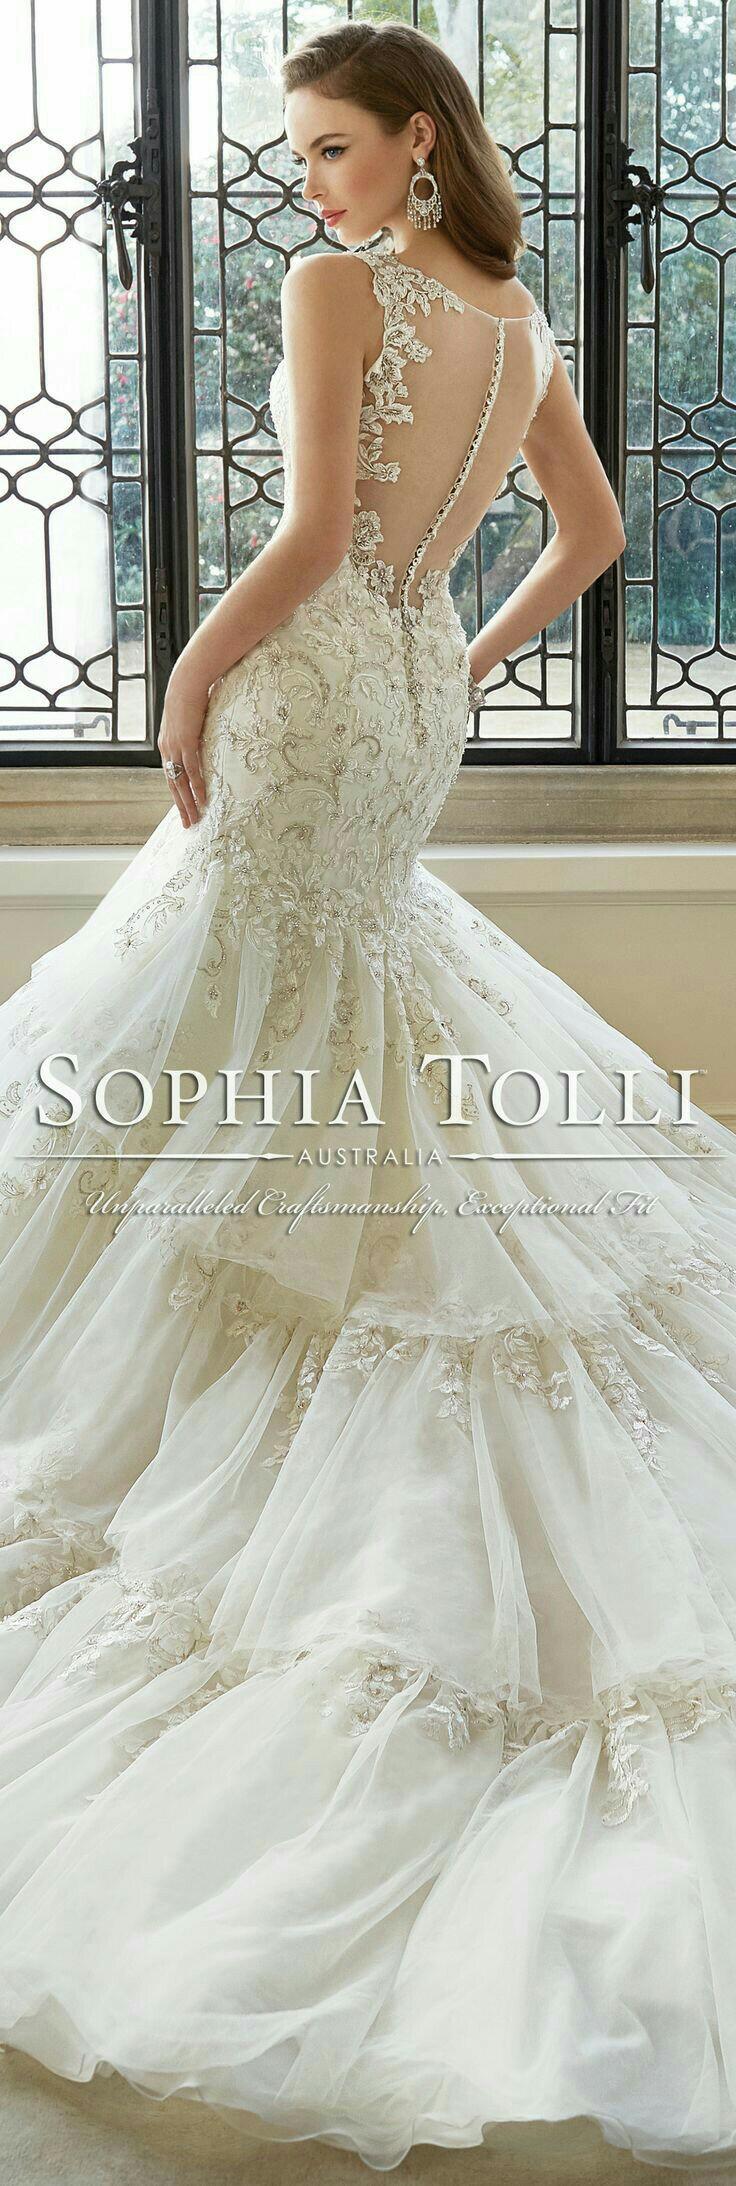 Pin de Trinh Deo en Wedding dresses   Pinterest   Vestidos de novia ...